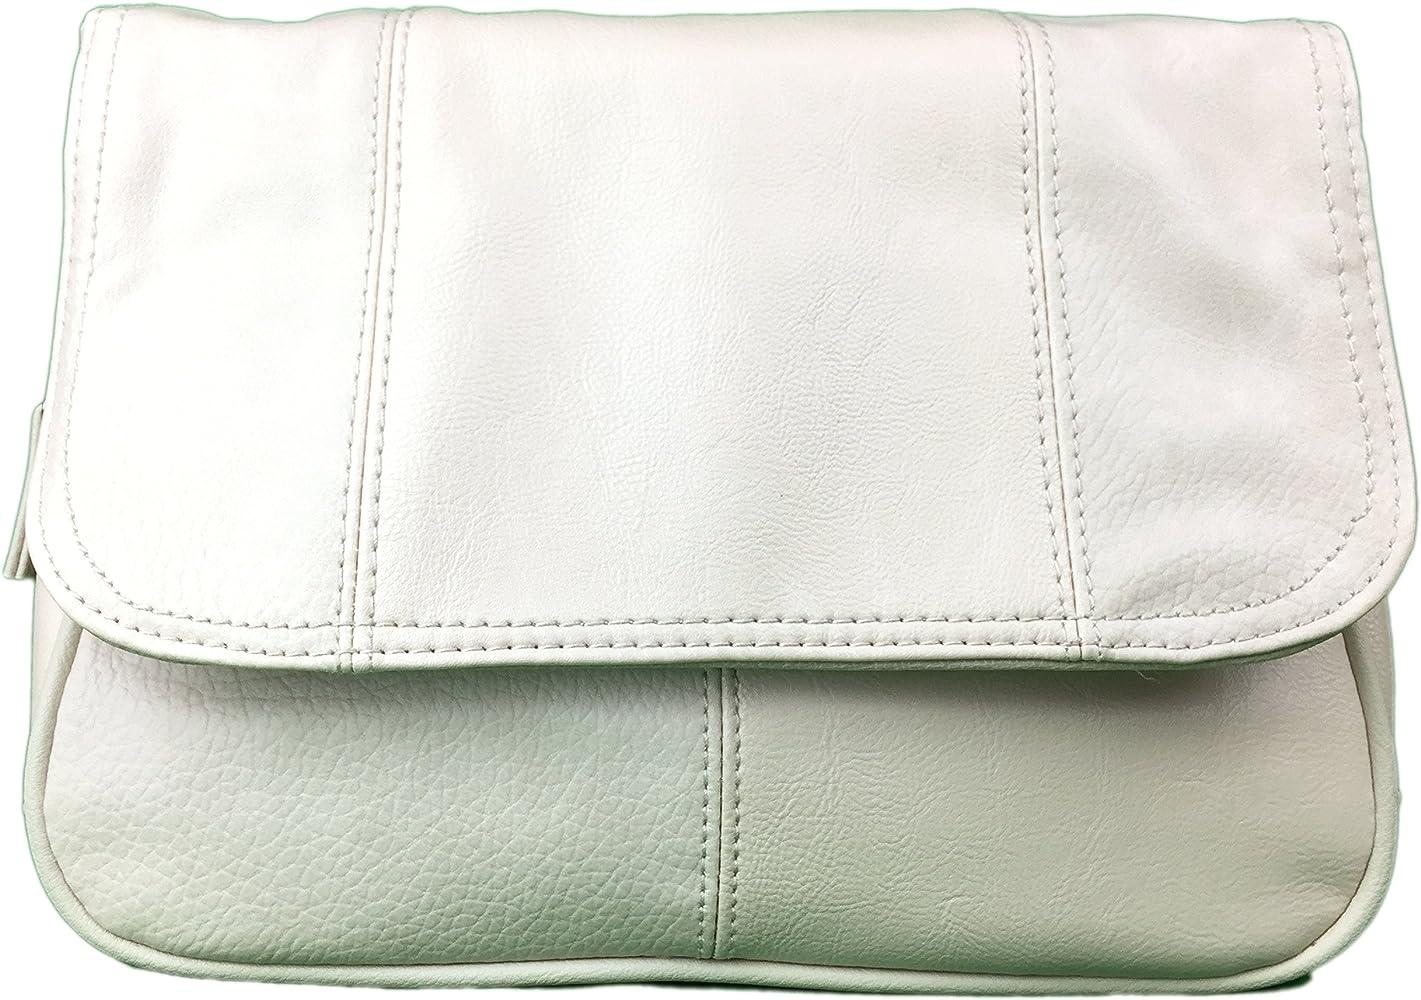 Faux Leather Flapover Style Handbag Compartments /& Adjustable Shoulder Strap